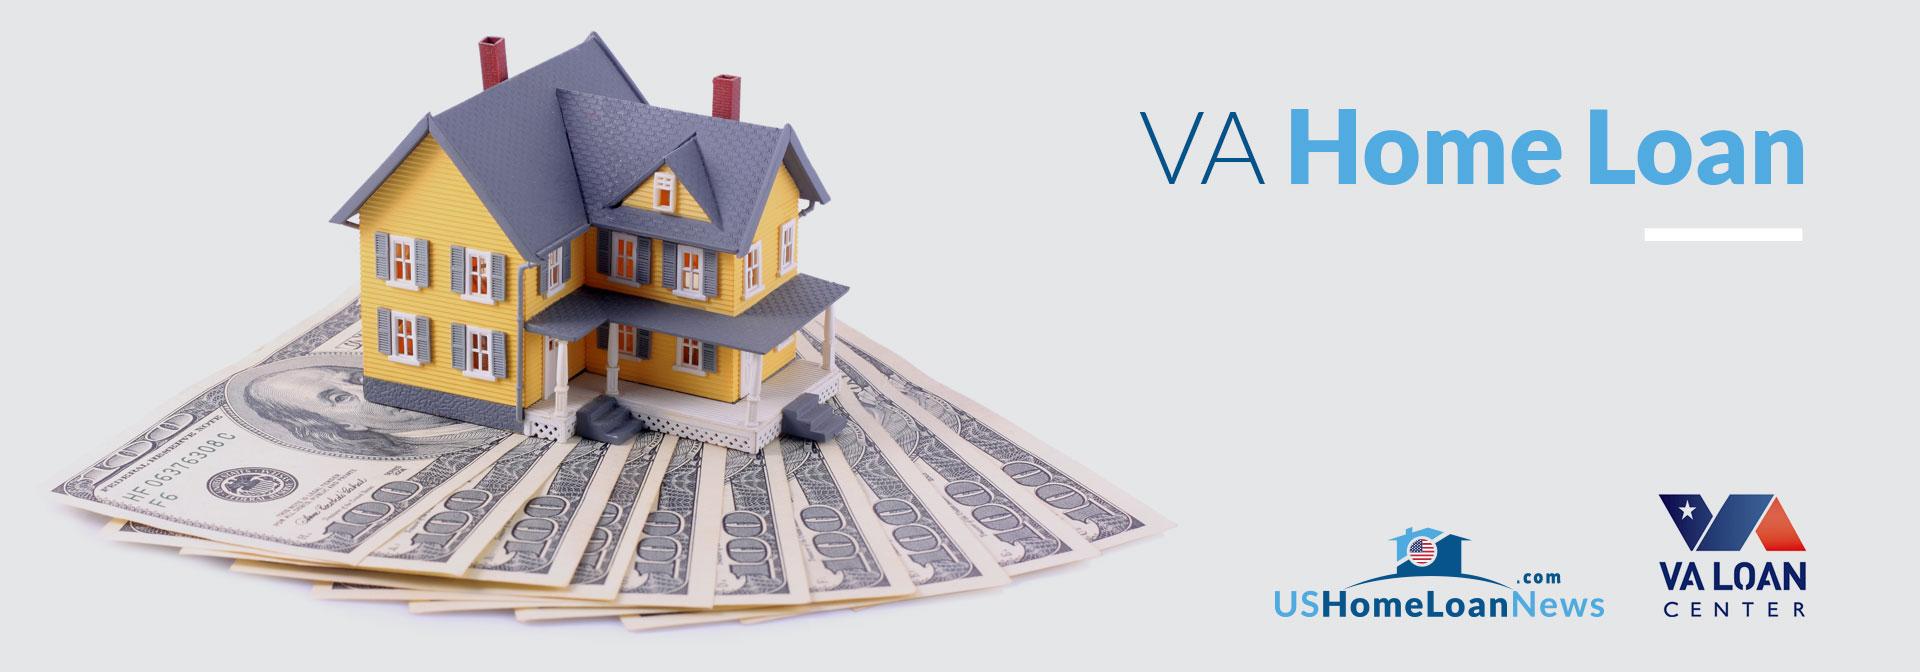 VA Home Loan from US Home Loan News